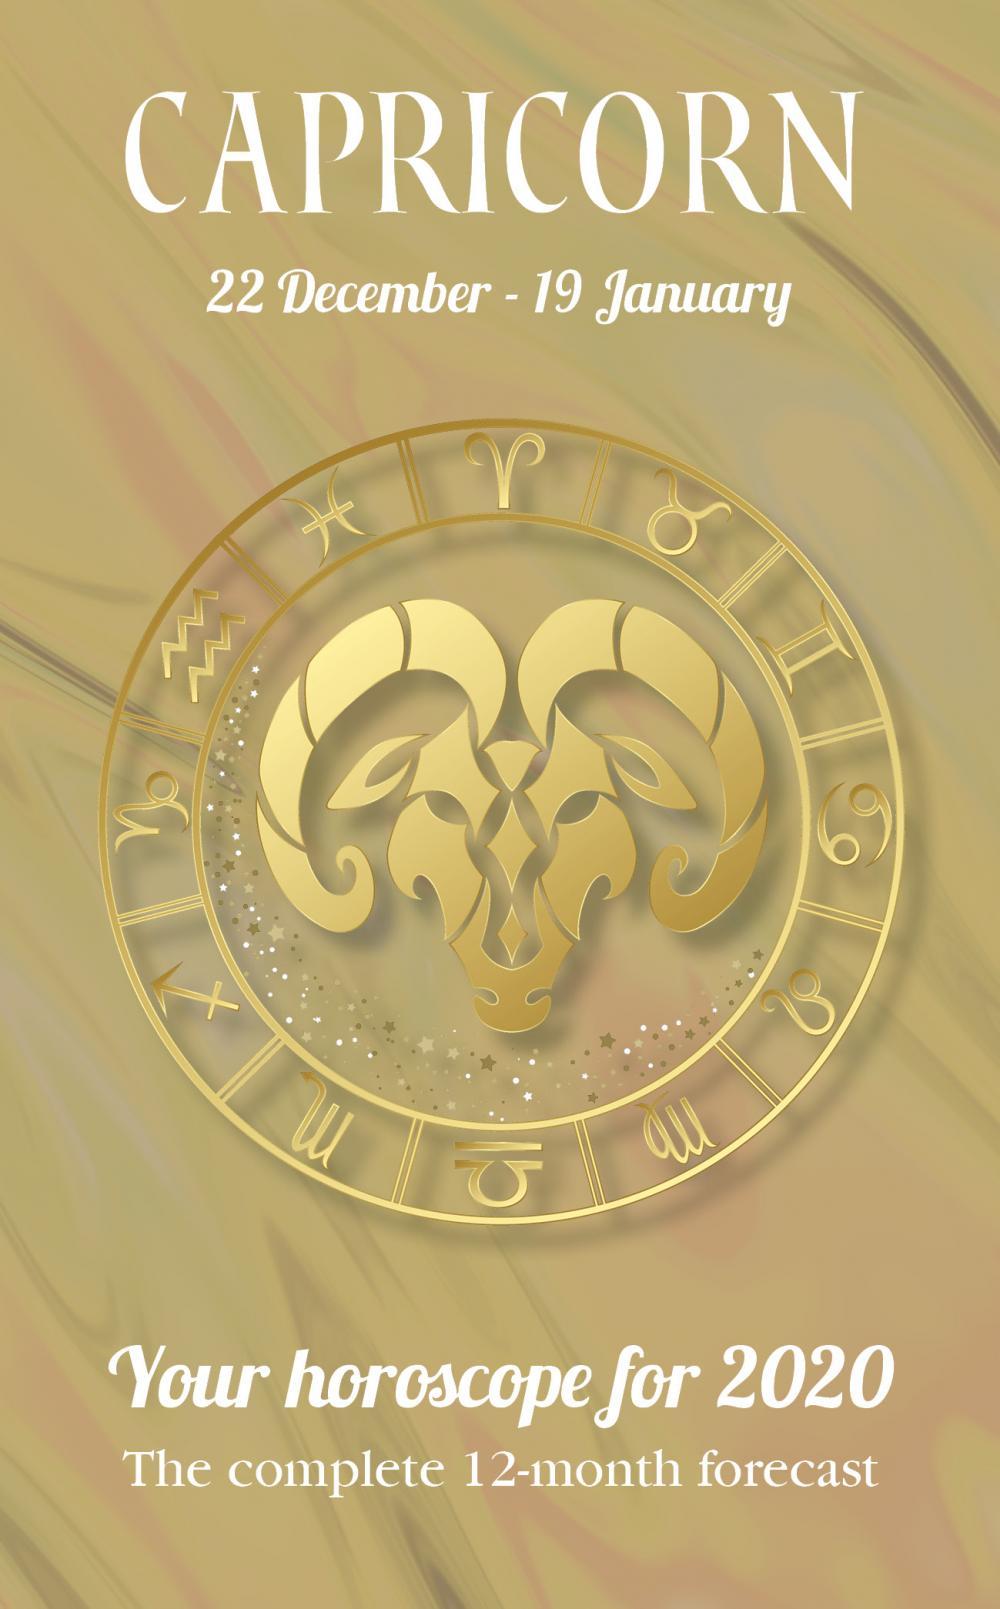 Your Horoscope for 2020: Capricorn